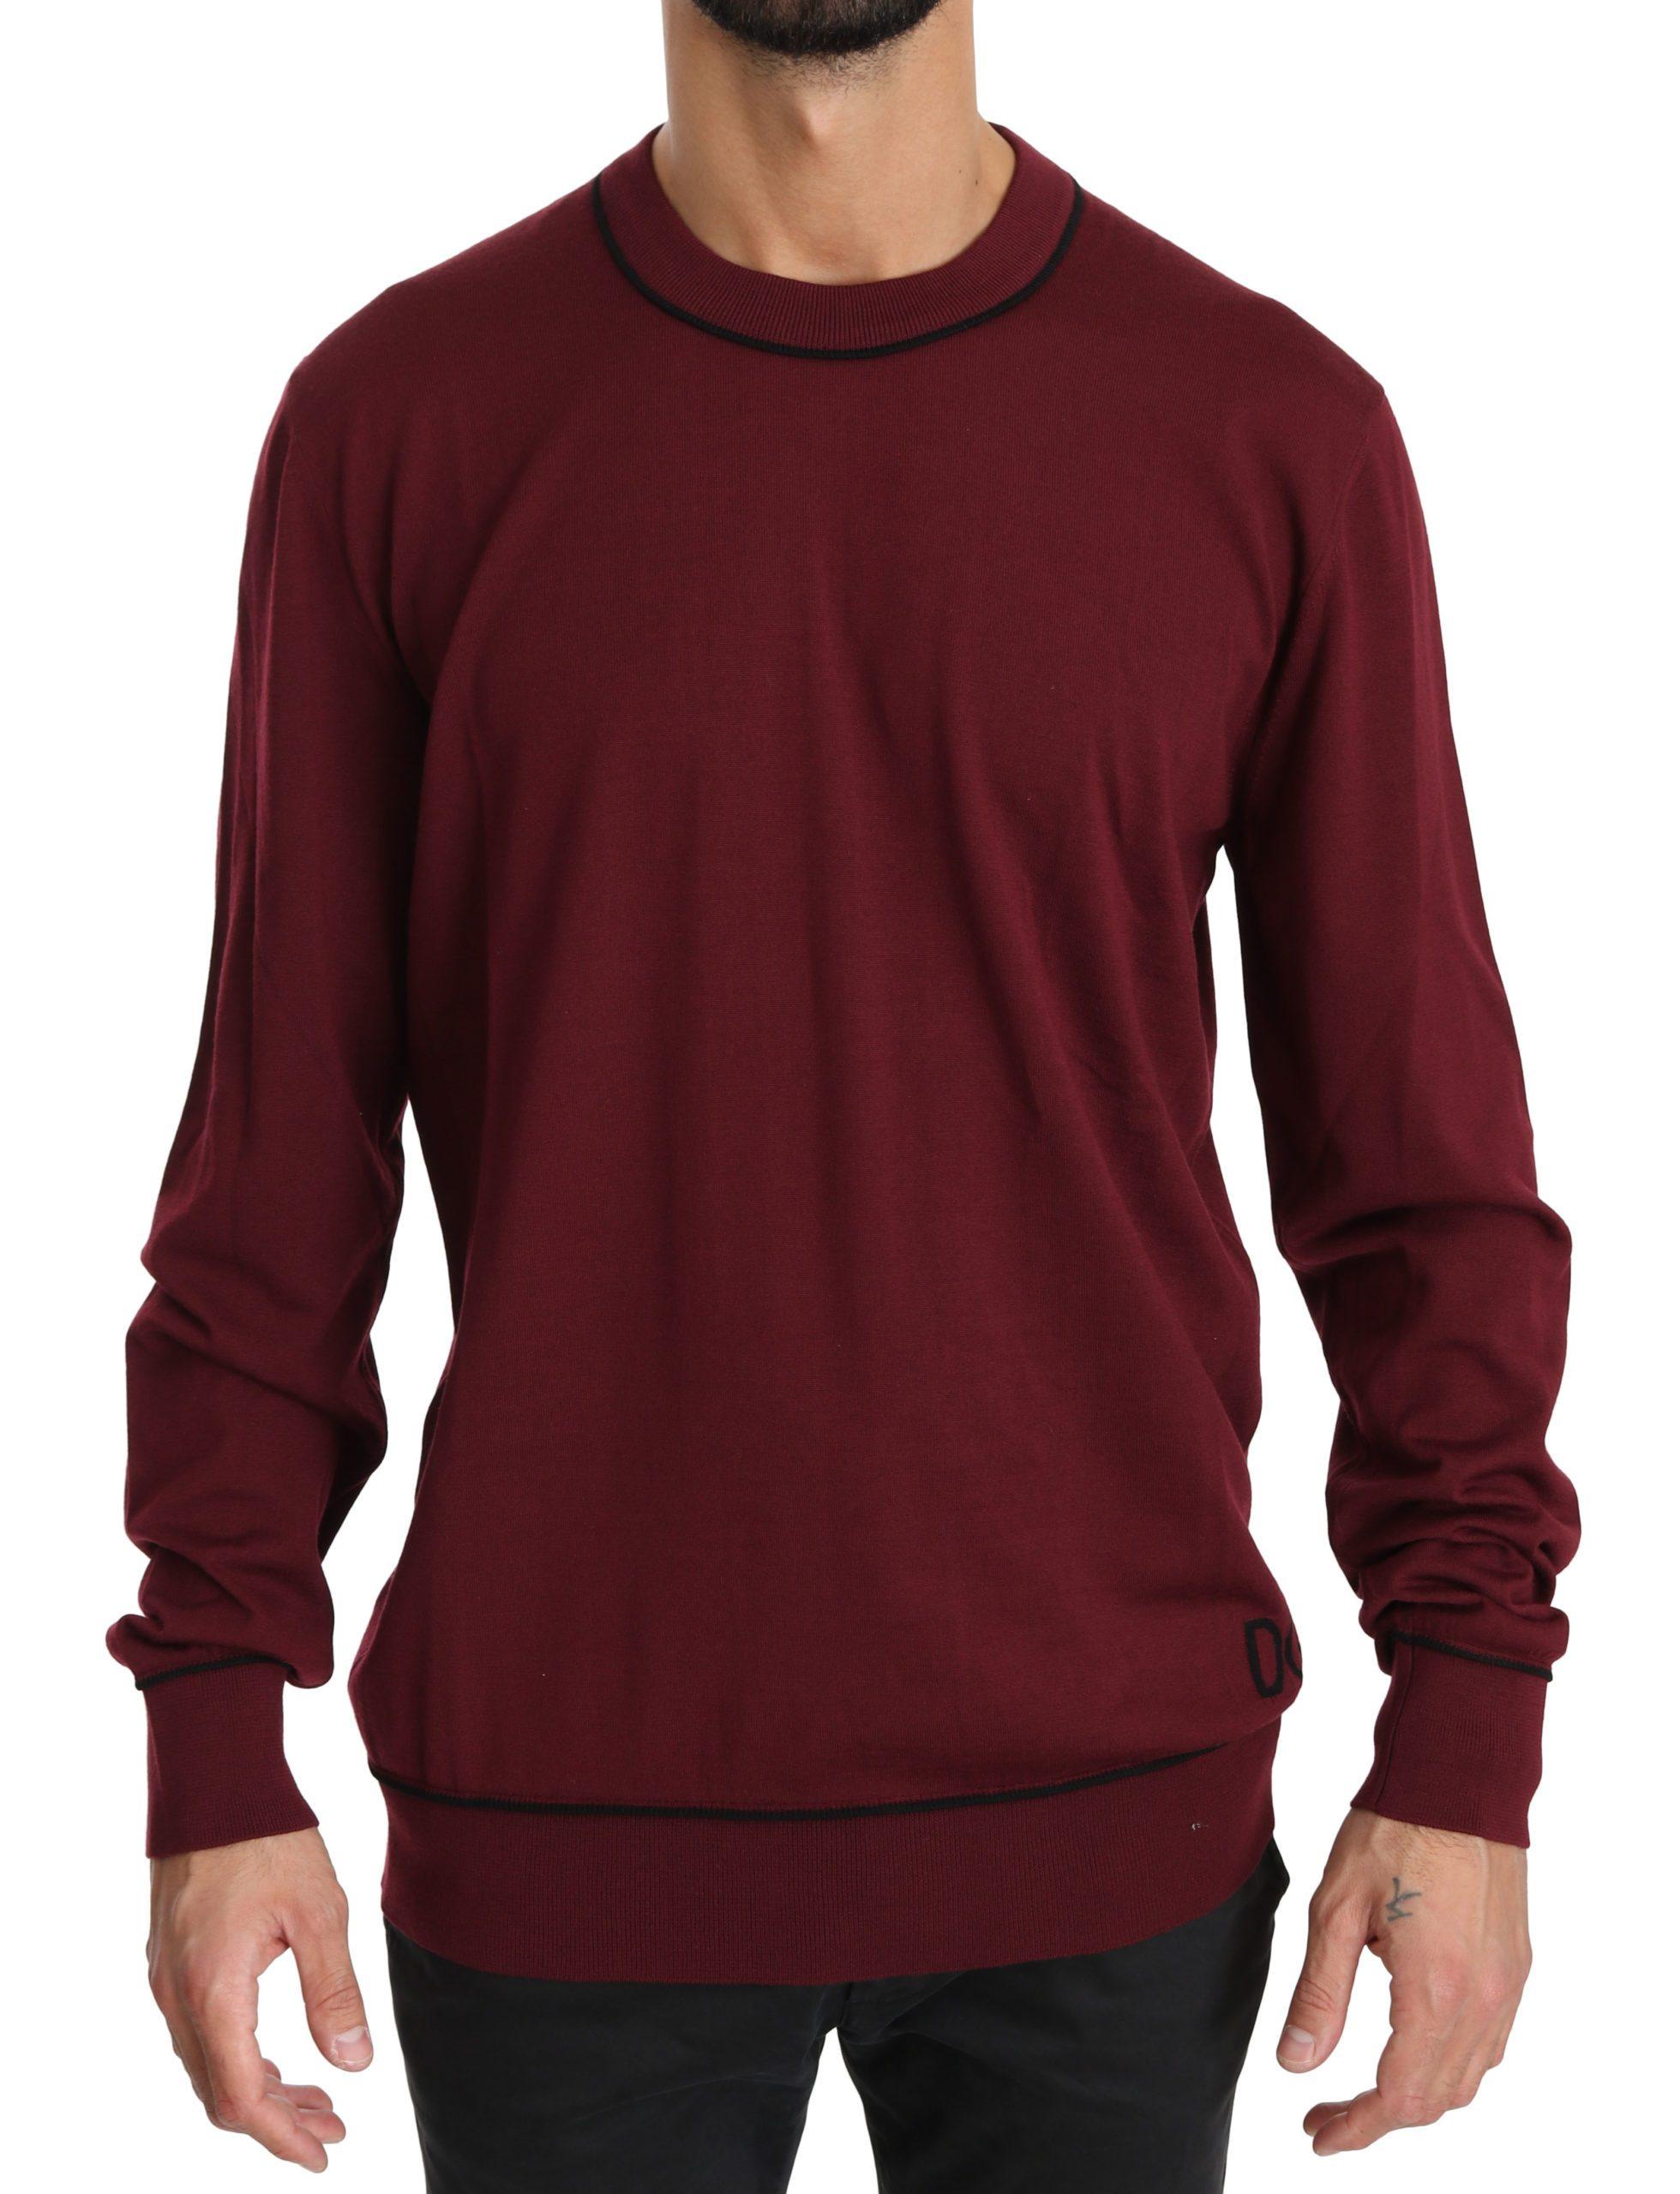 Dolce & Gabbana Men's Maroon DG Logo Crewneck Pullover Sweater Bordeaux - IT52 | XL